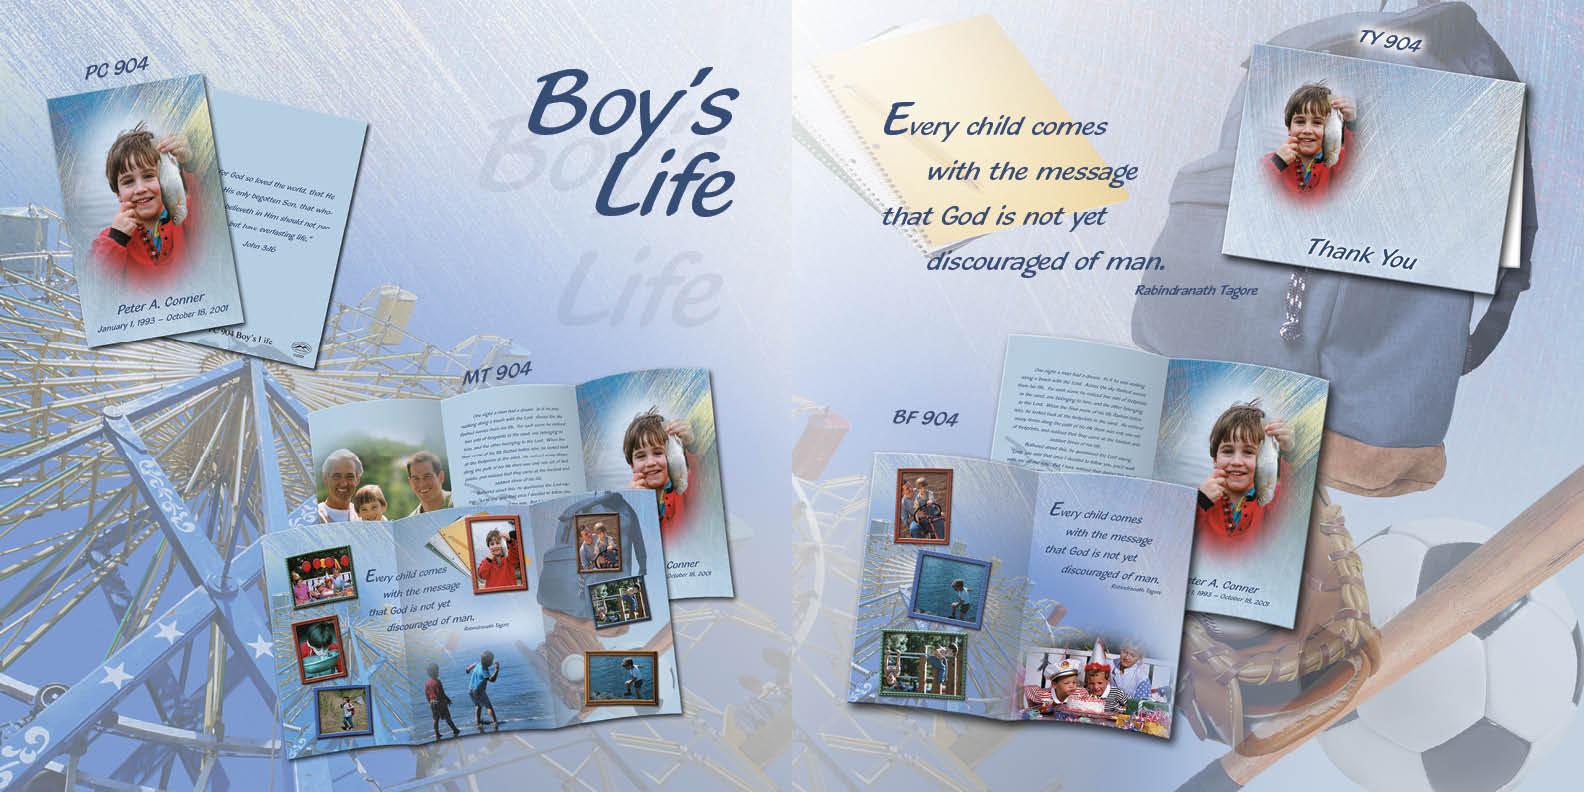 904 Boy's Life